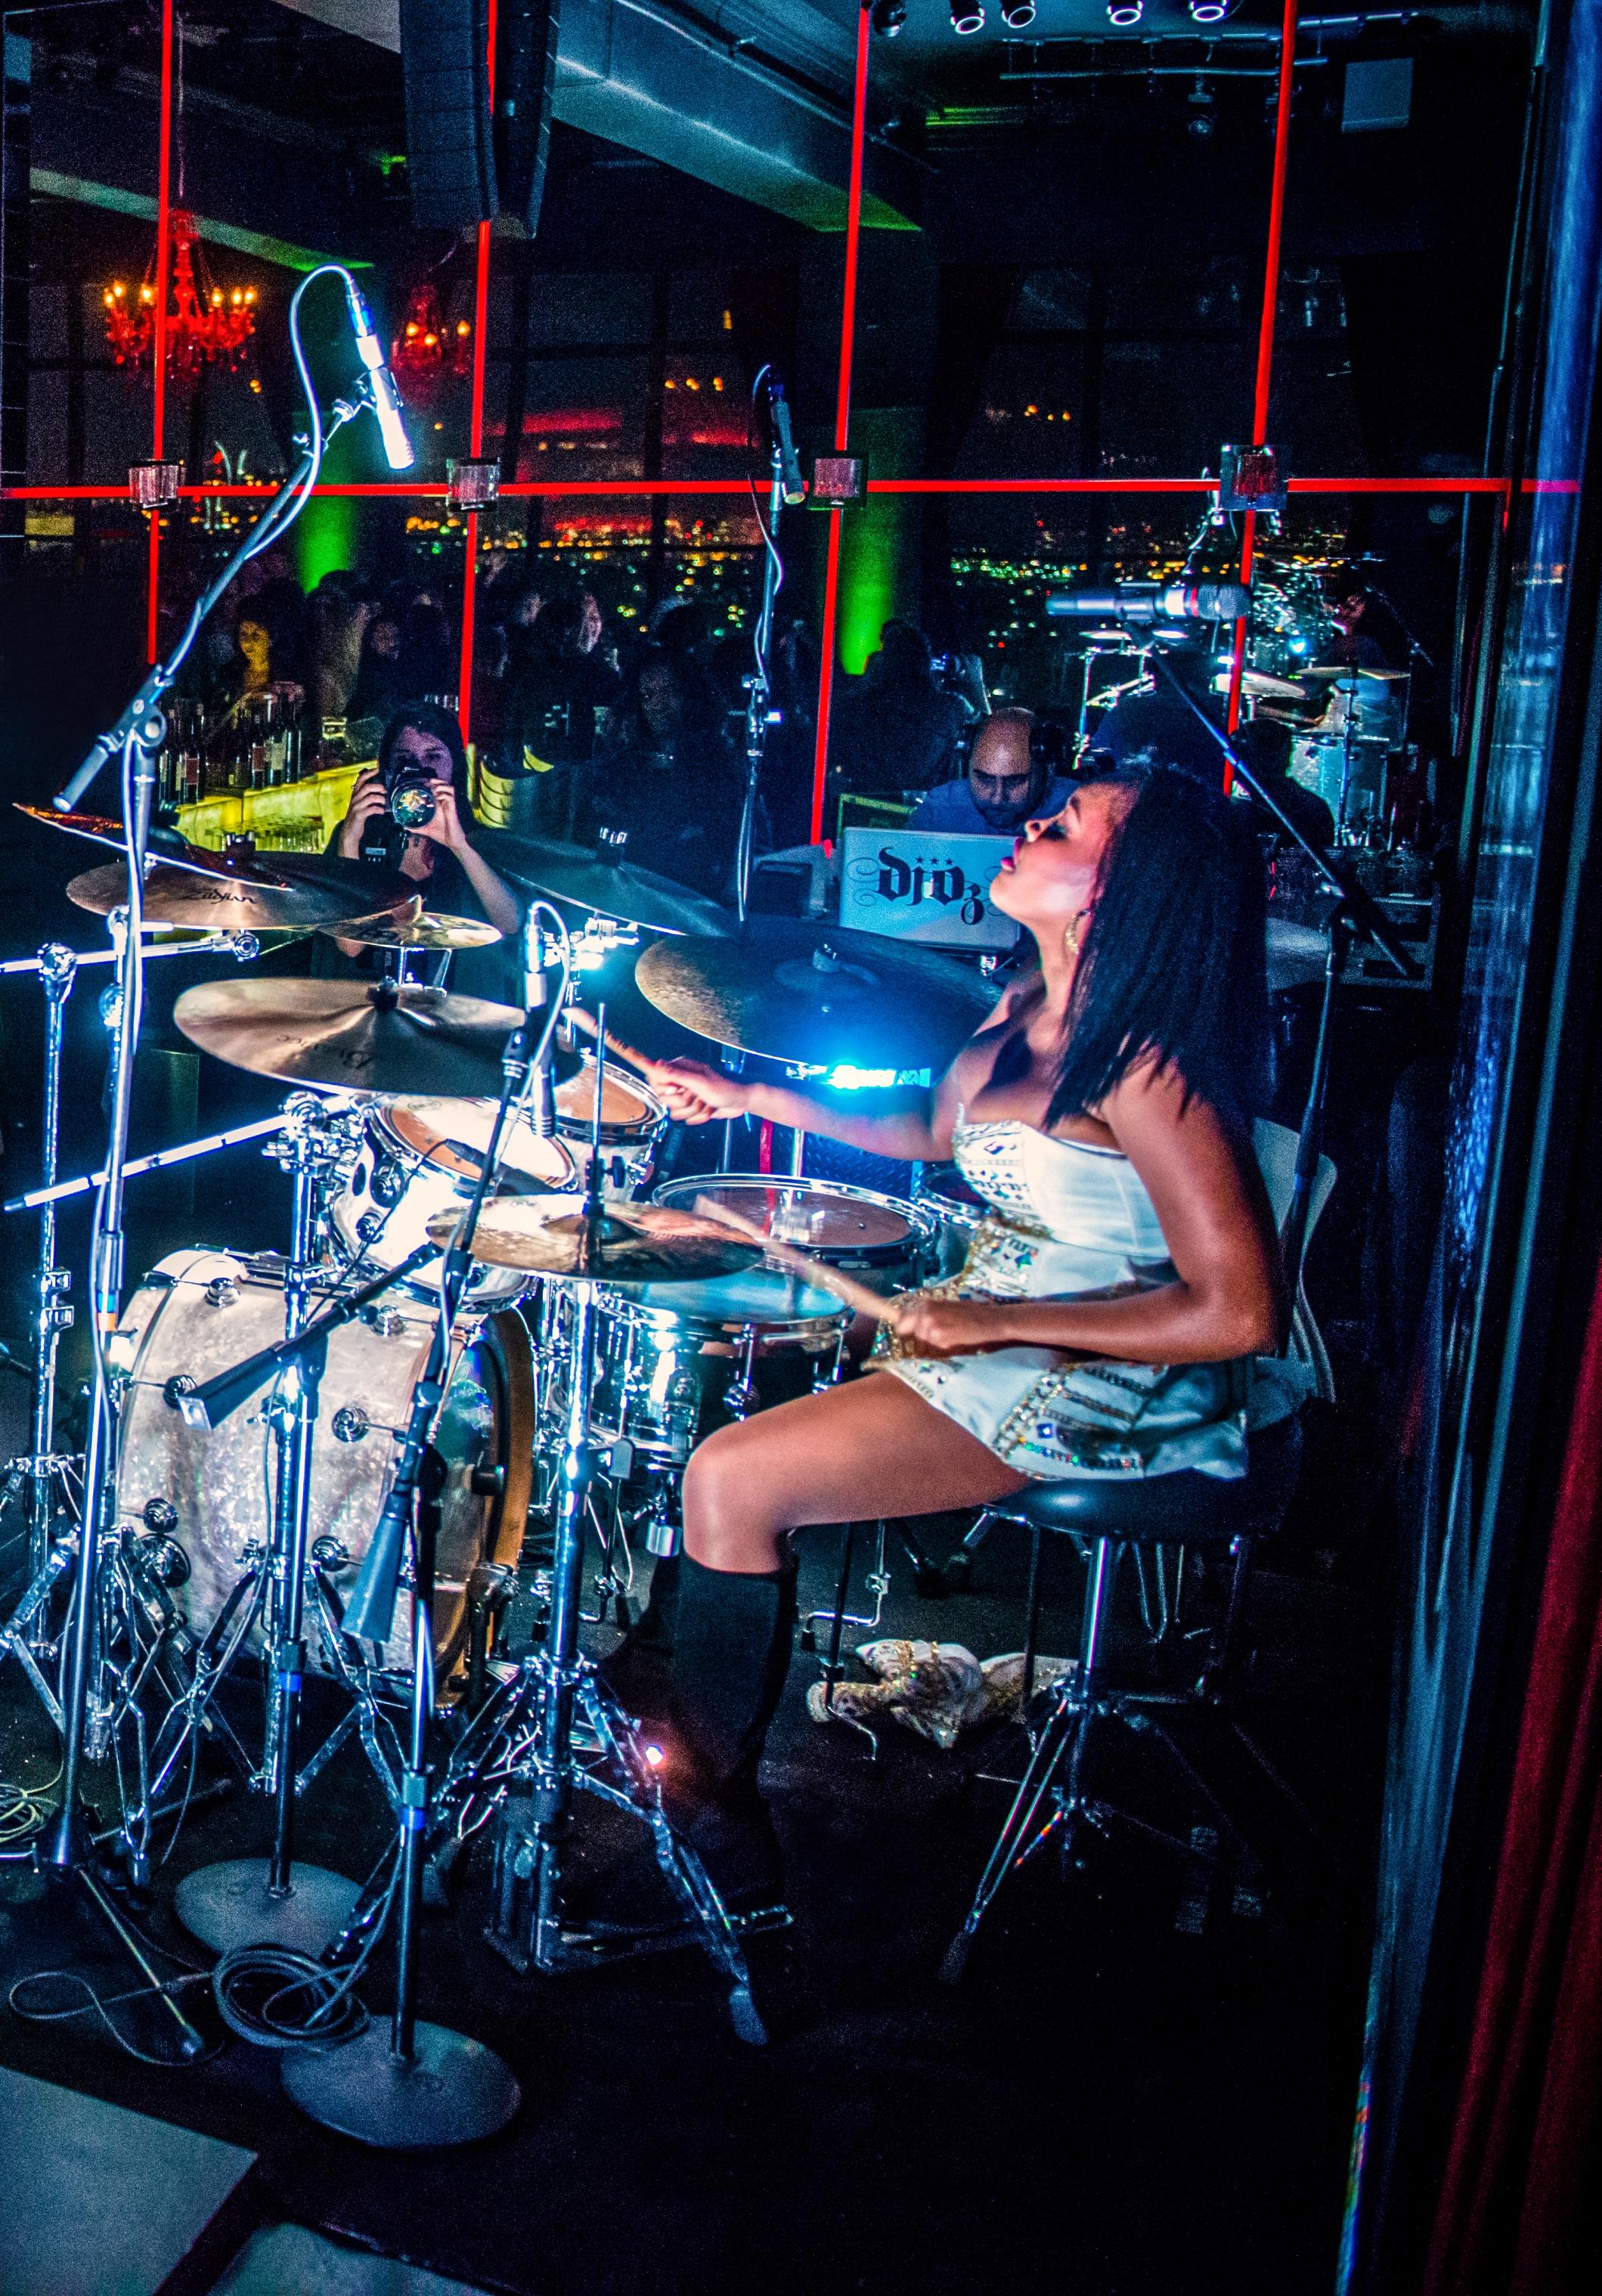 Glorious, Livetronica Drummer, Pop-R&B Singer, Producer, Live at W Washington, POV 5.jpg